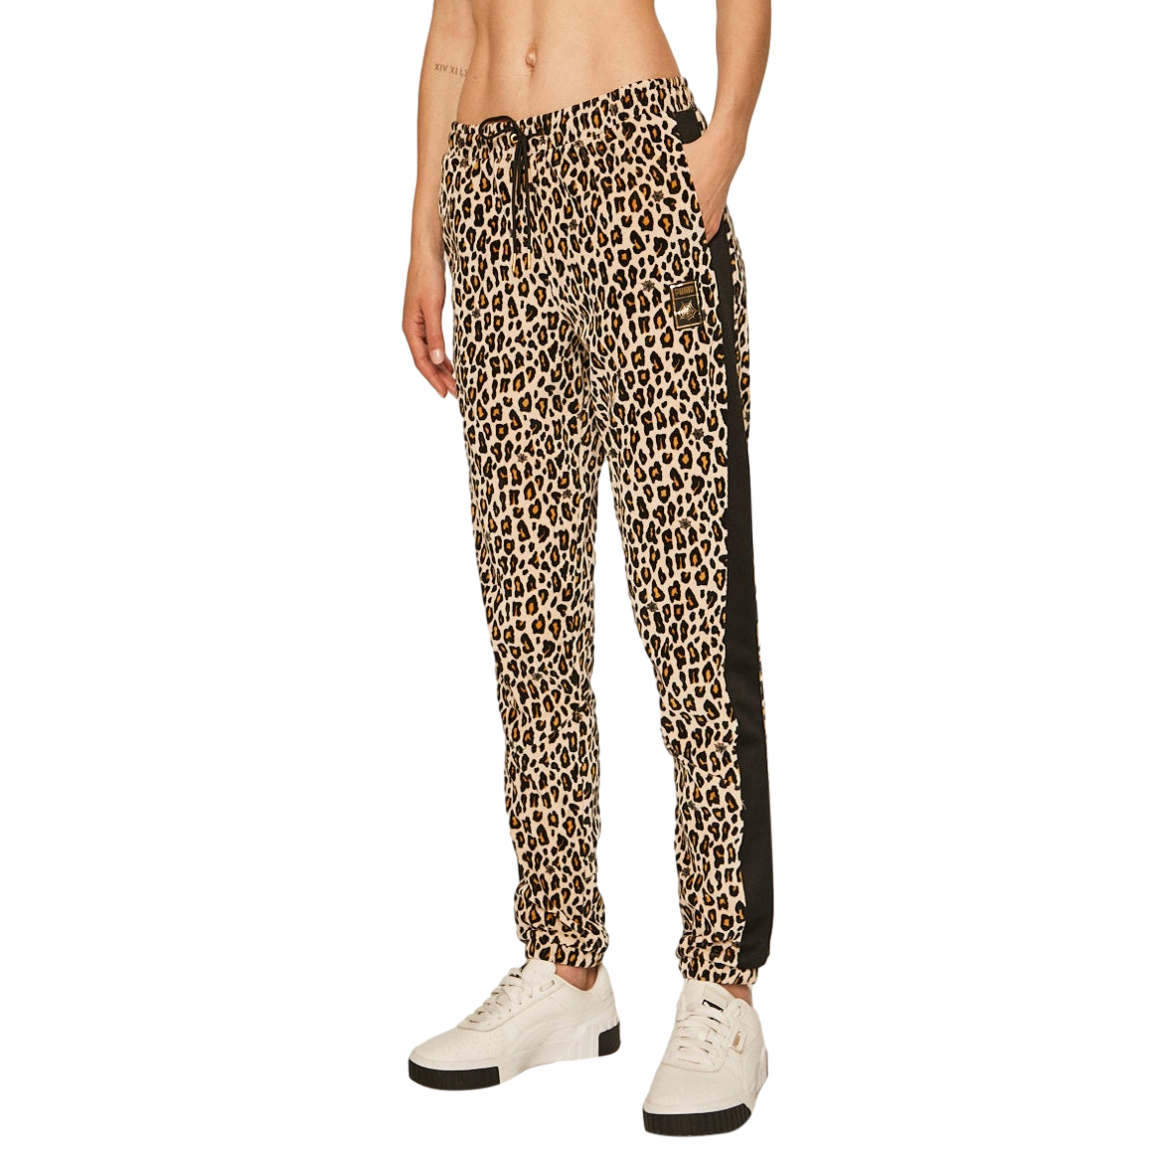 Charlotte Olympia leopard print velvet joggers